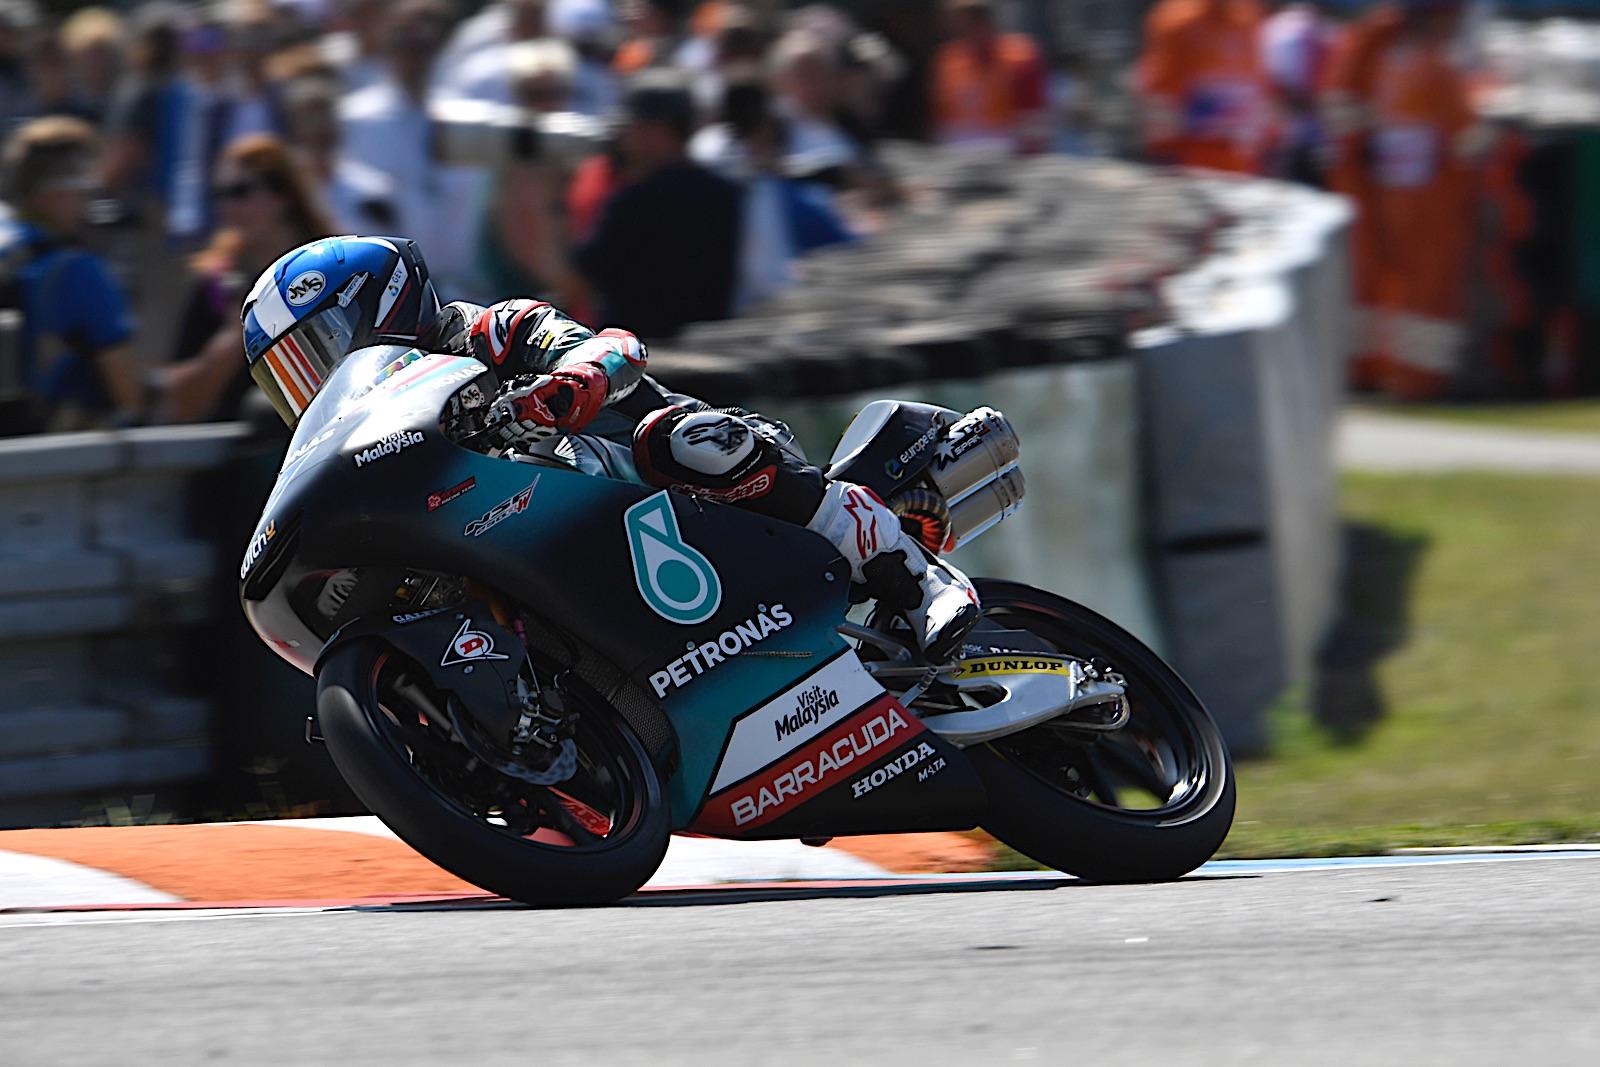 MotoGP battle in Brno was breathtaking   Report   Results